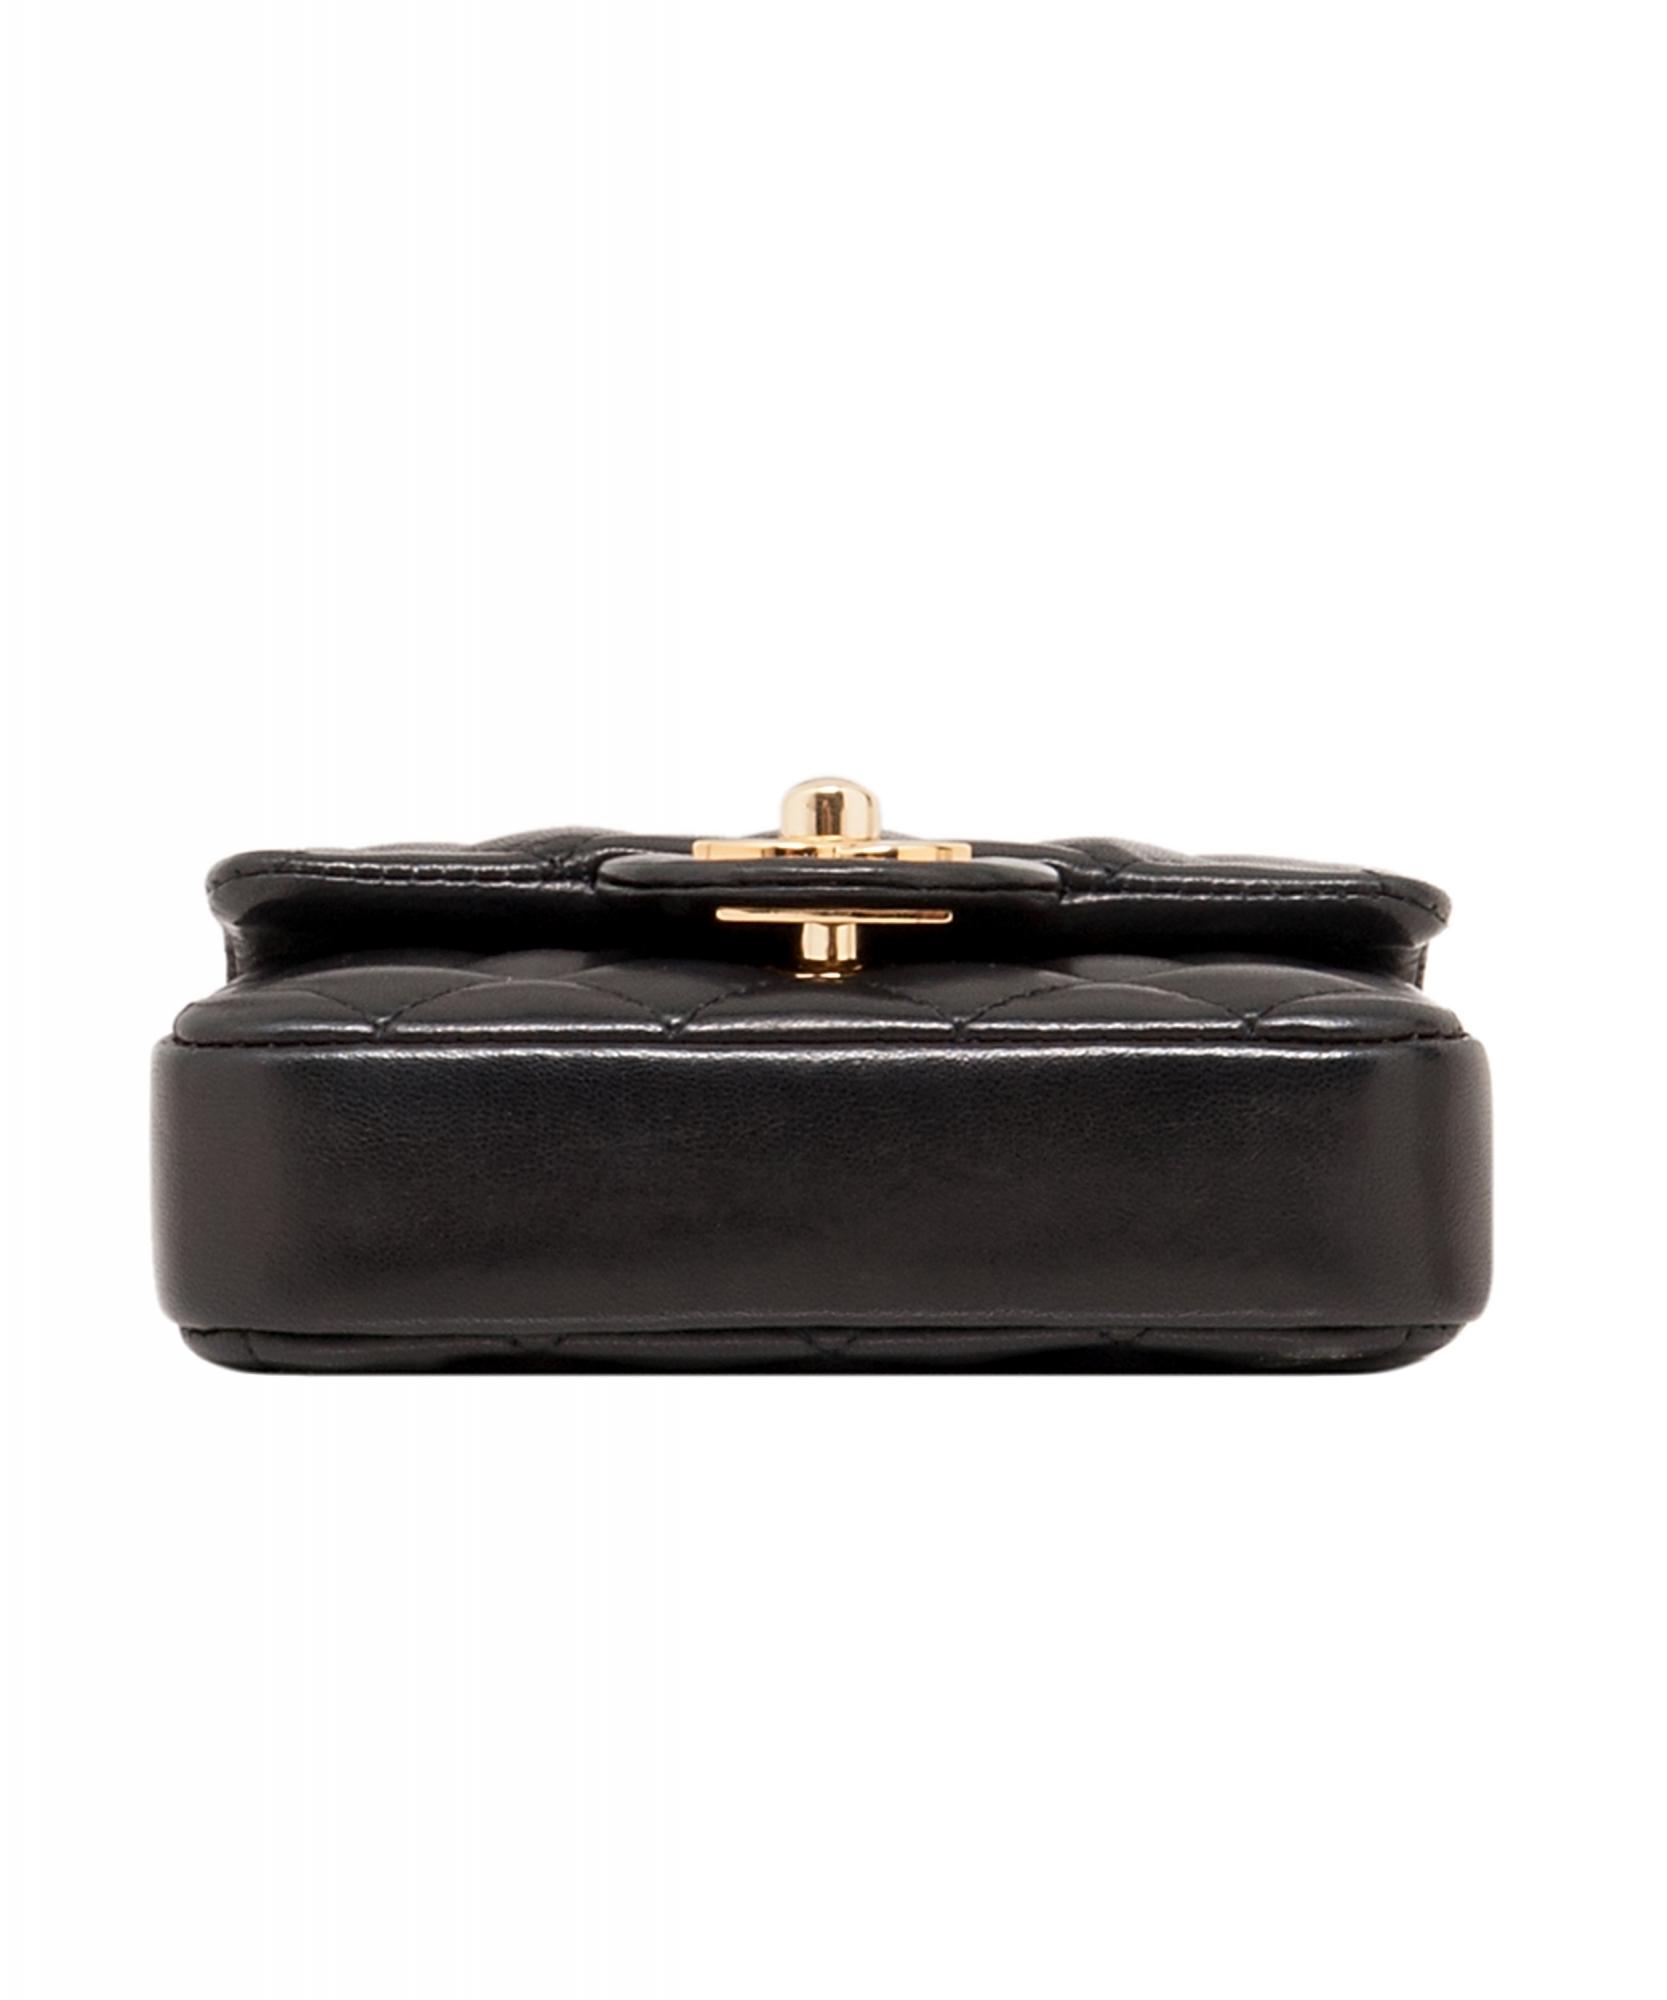 ... Chanel Black Micro Mini Classic Cross Body Bag. Tap to expand c38335c7659d2